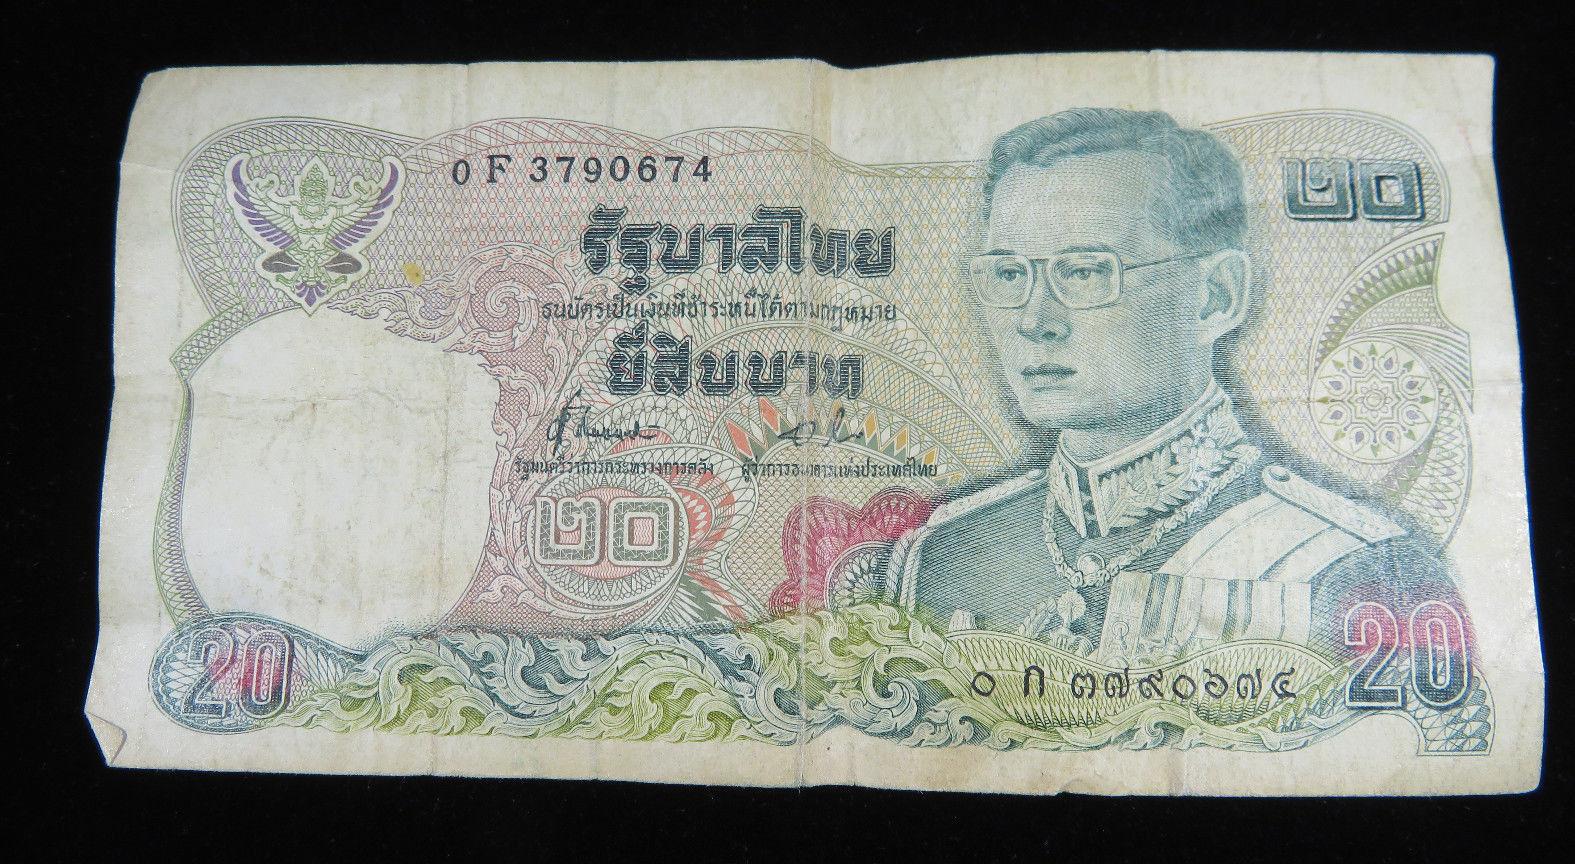 2015 Signature 87 UNC Banknote Thailand 100 Baht p-120 2